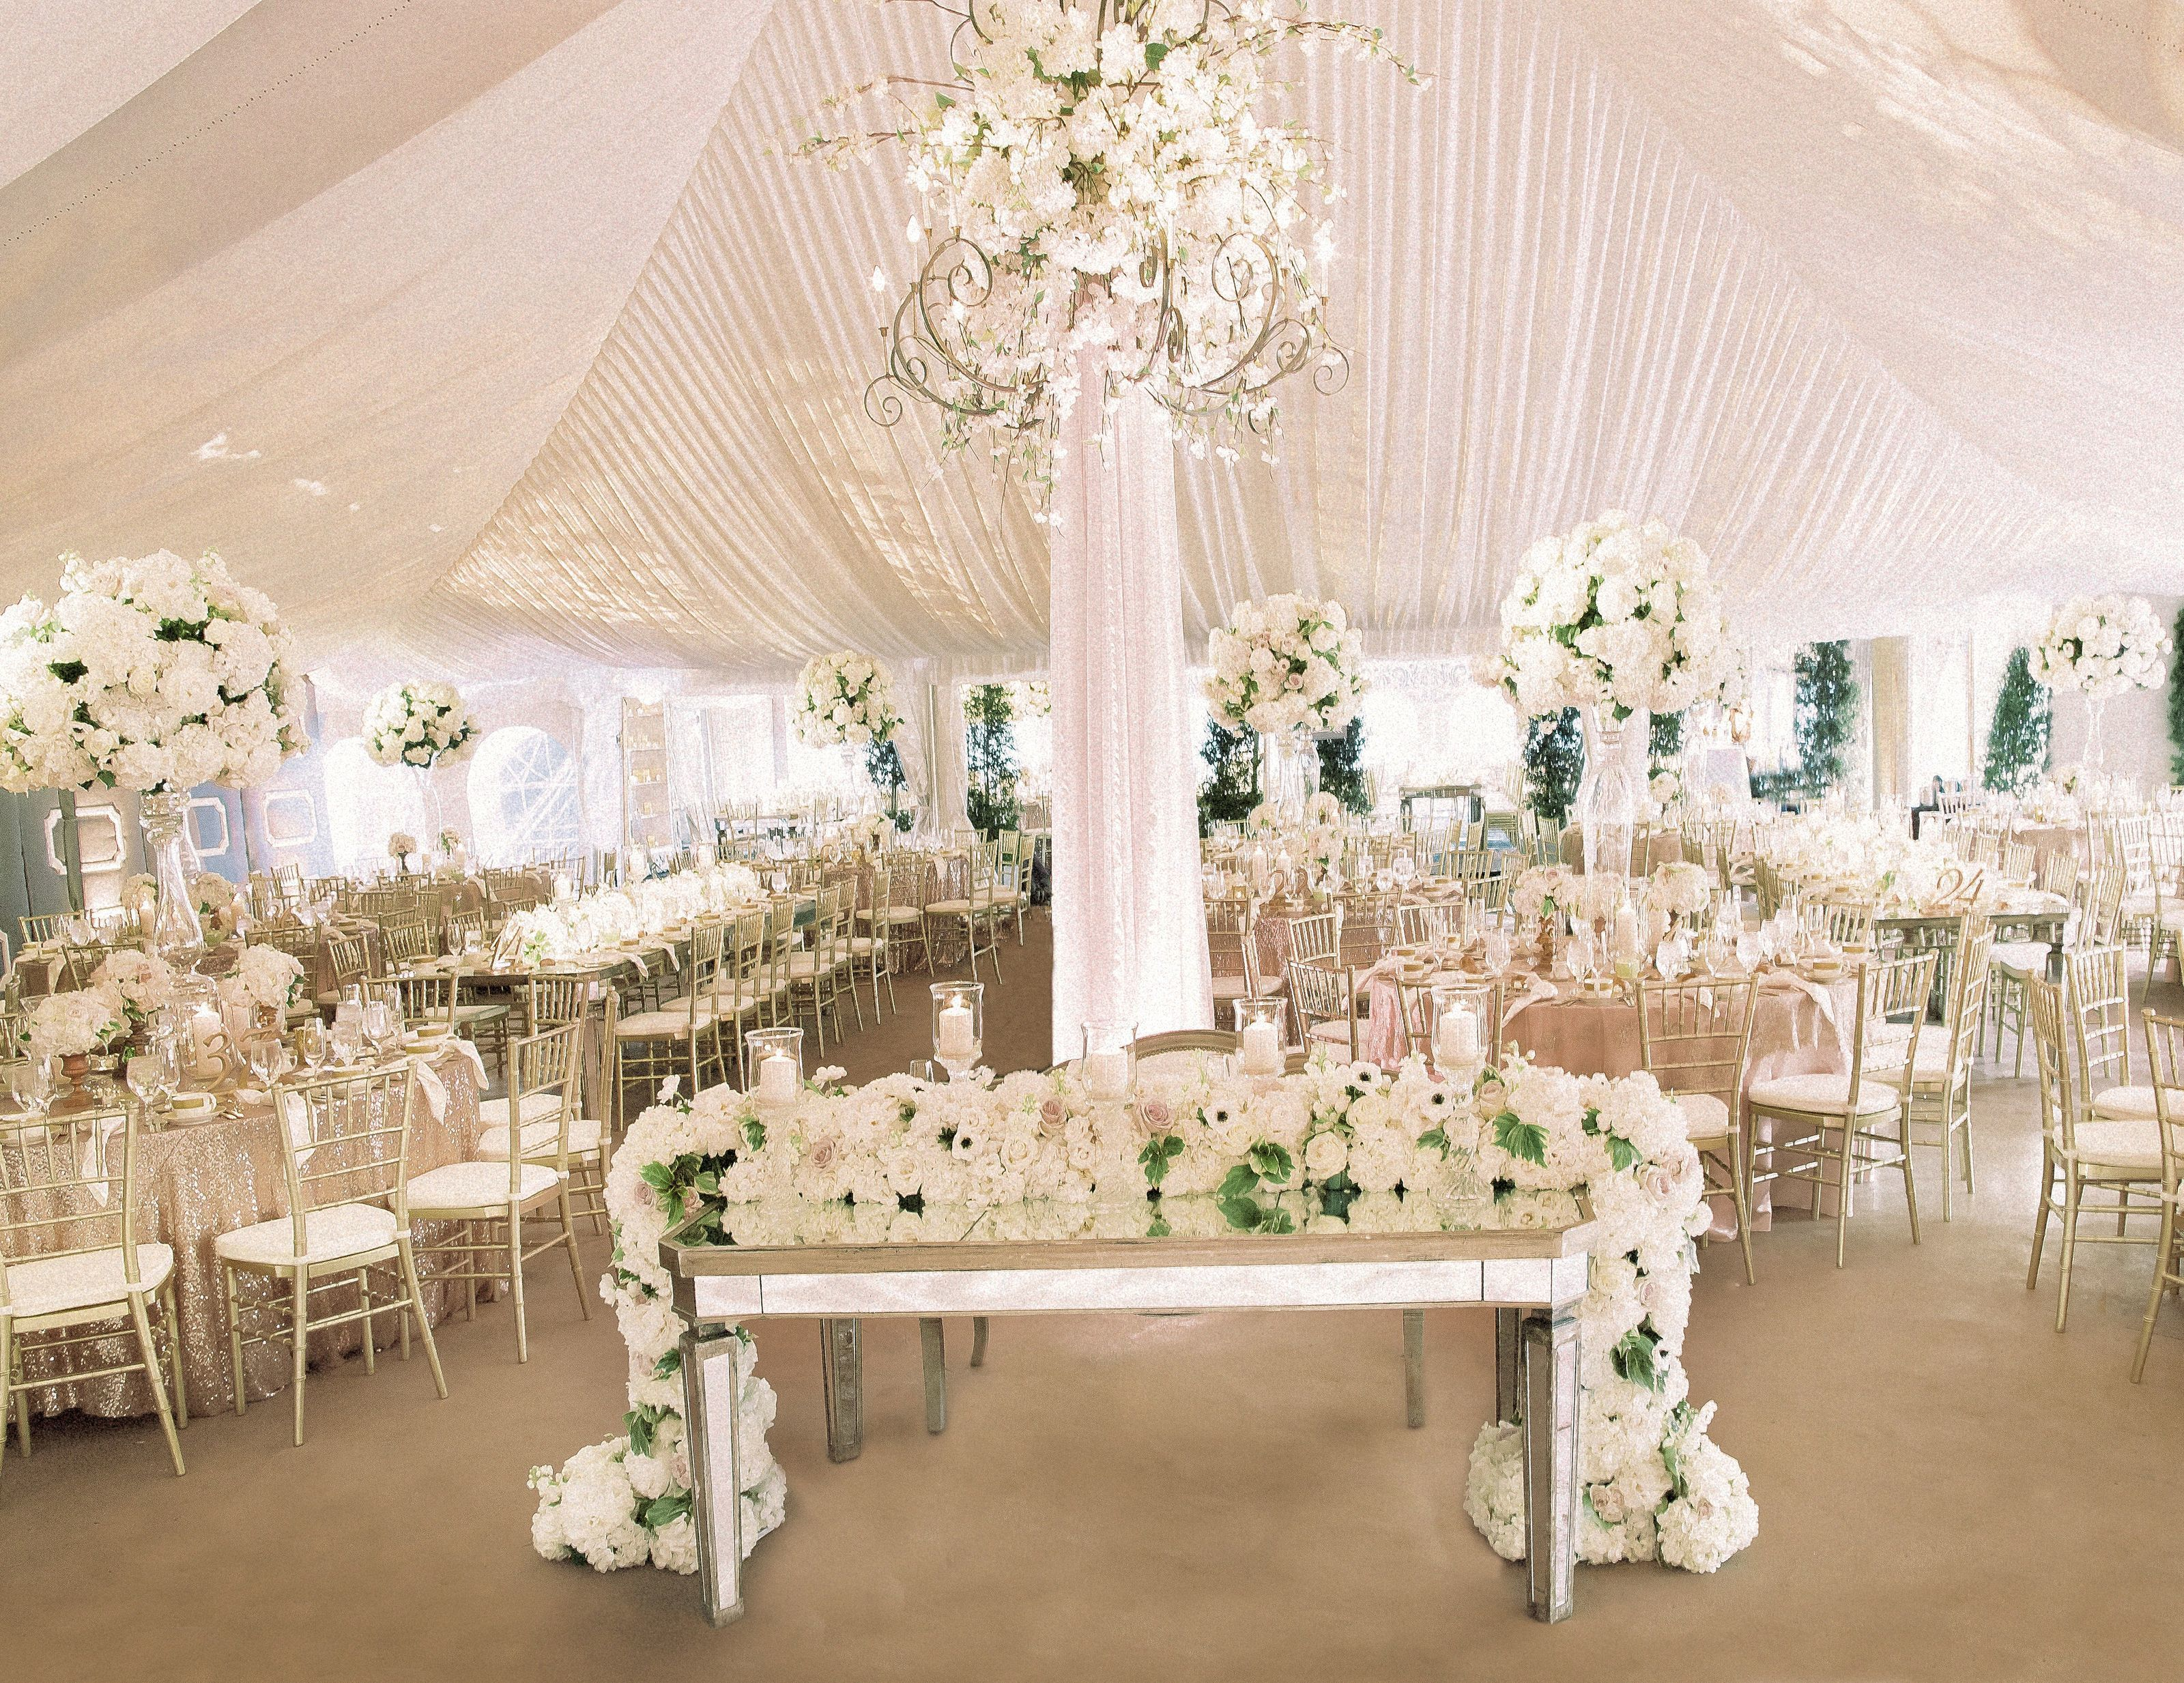 Photography: http://www.blainesiesser.com/ | Event design: http://kehoedesigns.com/ | Event coordination: http://partyassurance.com/ | Floral design: http://kehoedesigns.com/ | Wedding dress: http://www.eliesaab.com/ | Tuxedo: http://sammichaels.com/ | Wedding venue: http://meadowbrookhall.org/ | Read More: https://www.stylemepretty.com/2016/09/14/timeless-elegant-all-white-midwest-wedding/